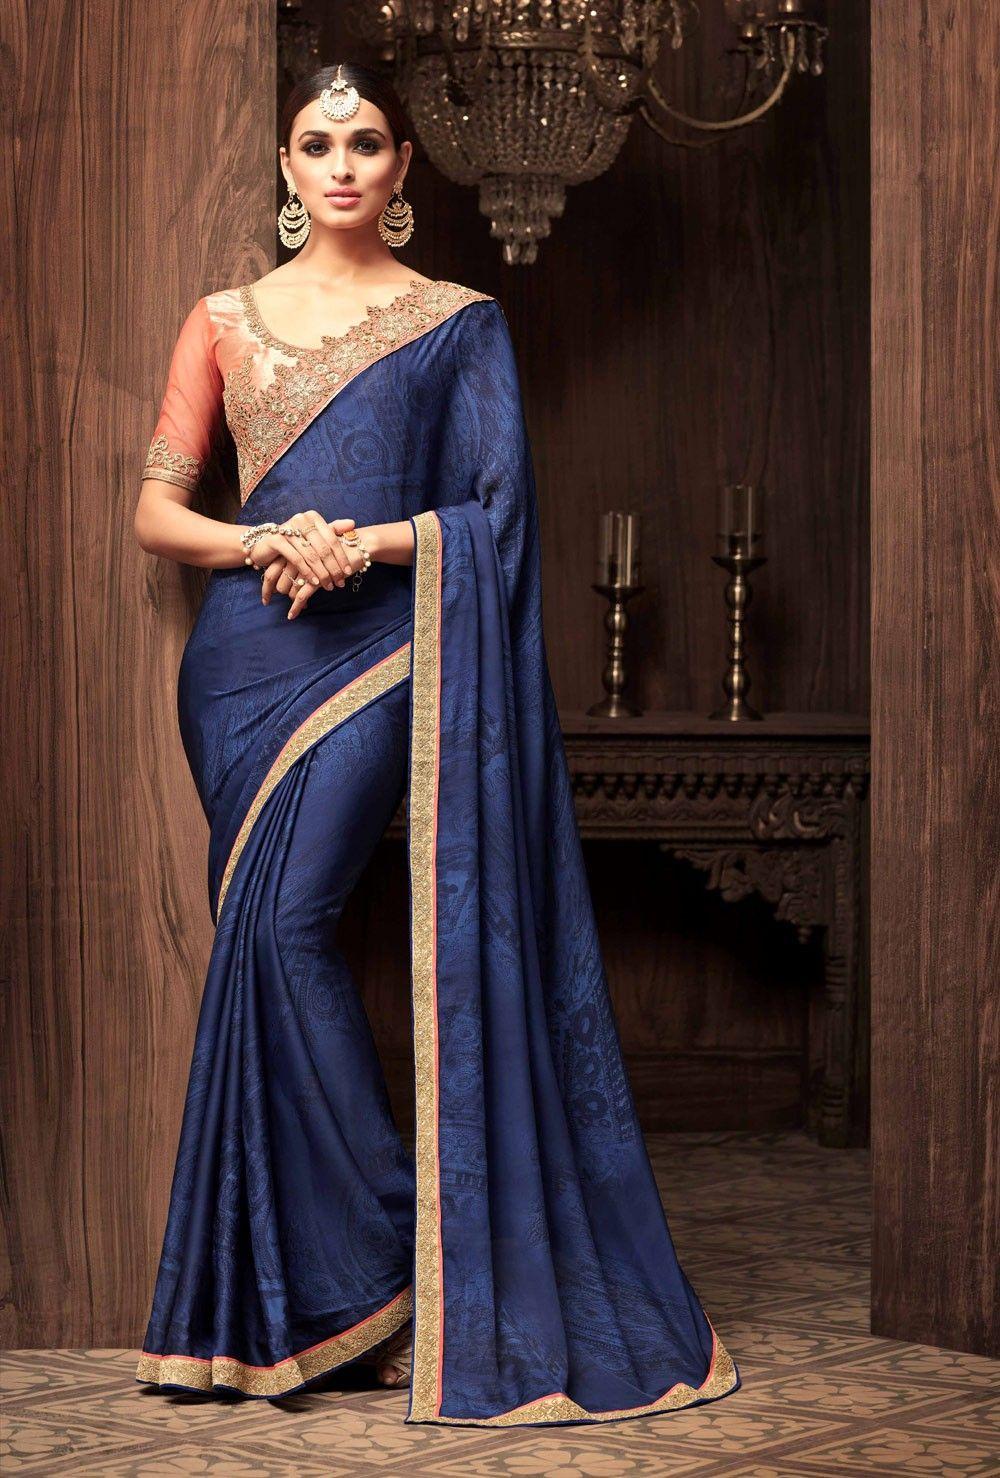 60a80c19114a9 Blue designer saree with contrast peach blouse